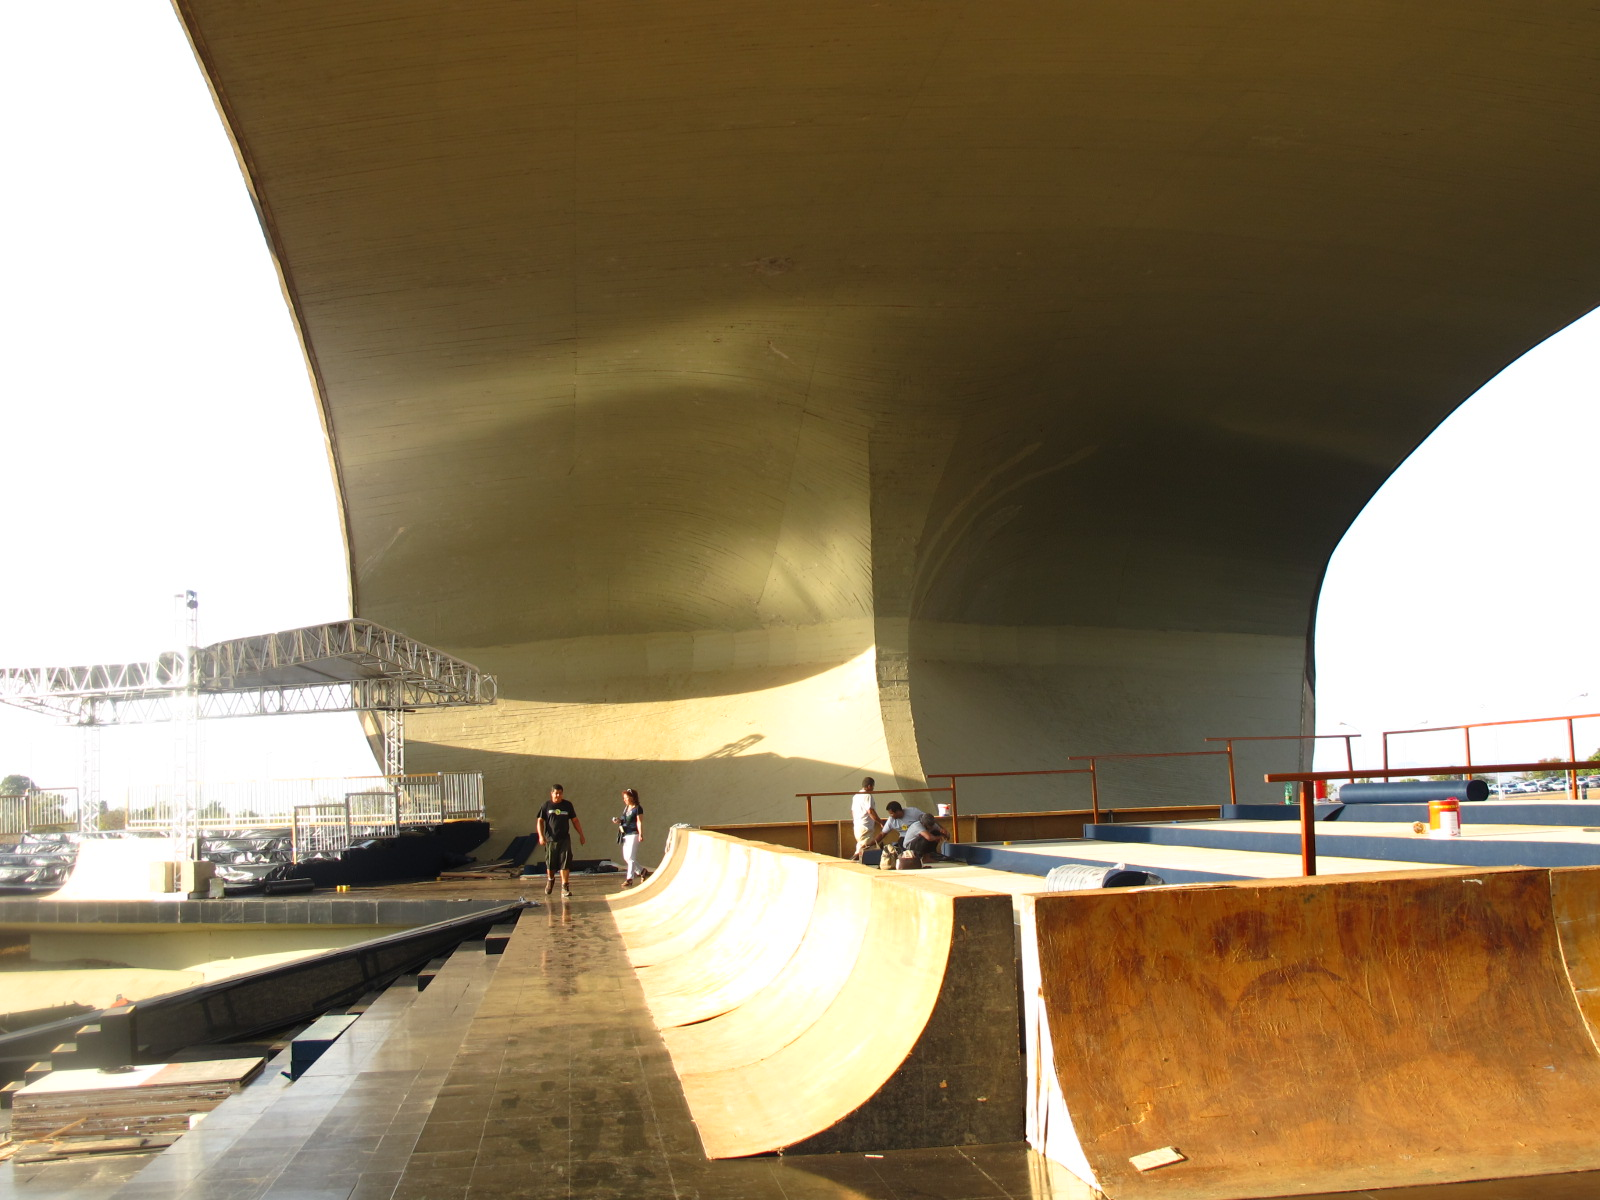 Ciudades brasilia portal de arquitectos - Arquitecto de brasilia ...